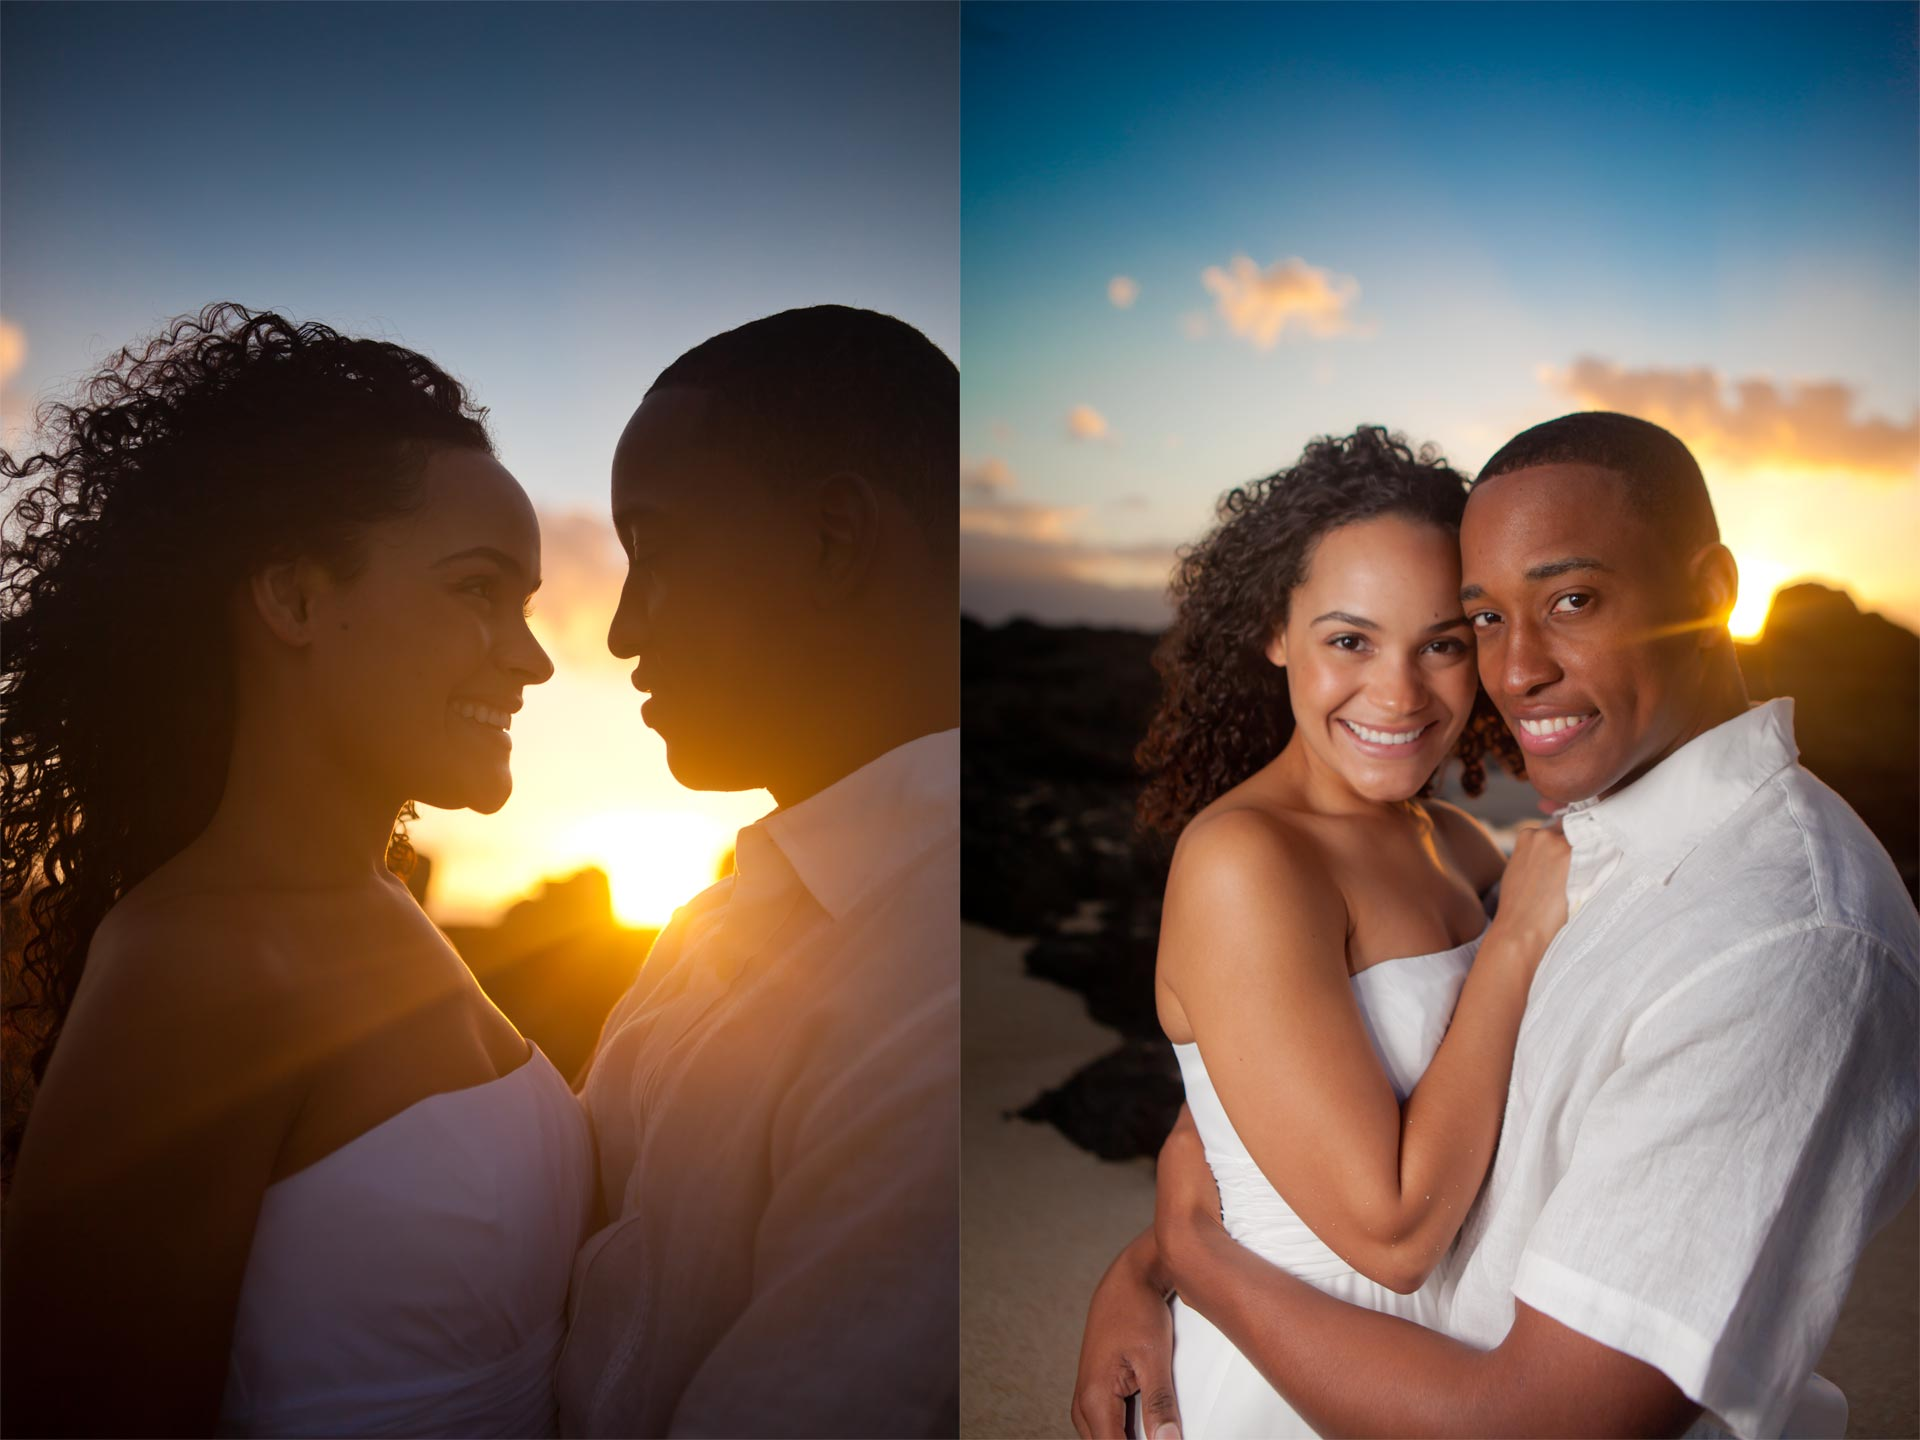 Sunset Beach wedding on Oahu's North Shore